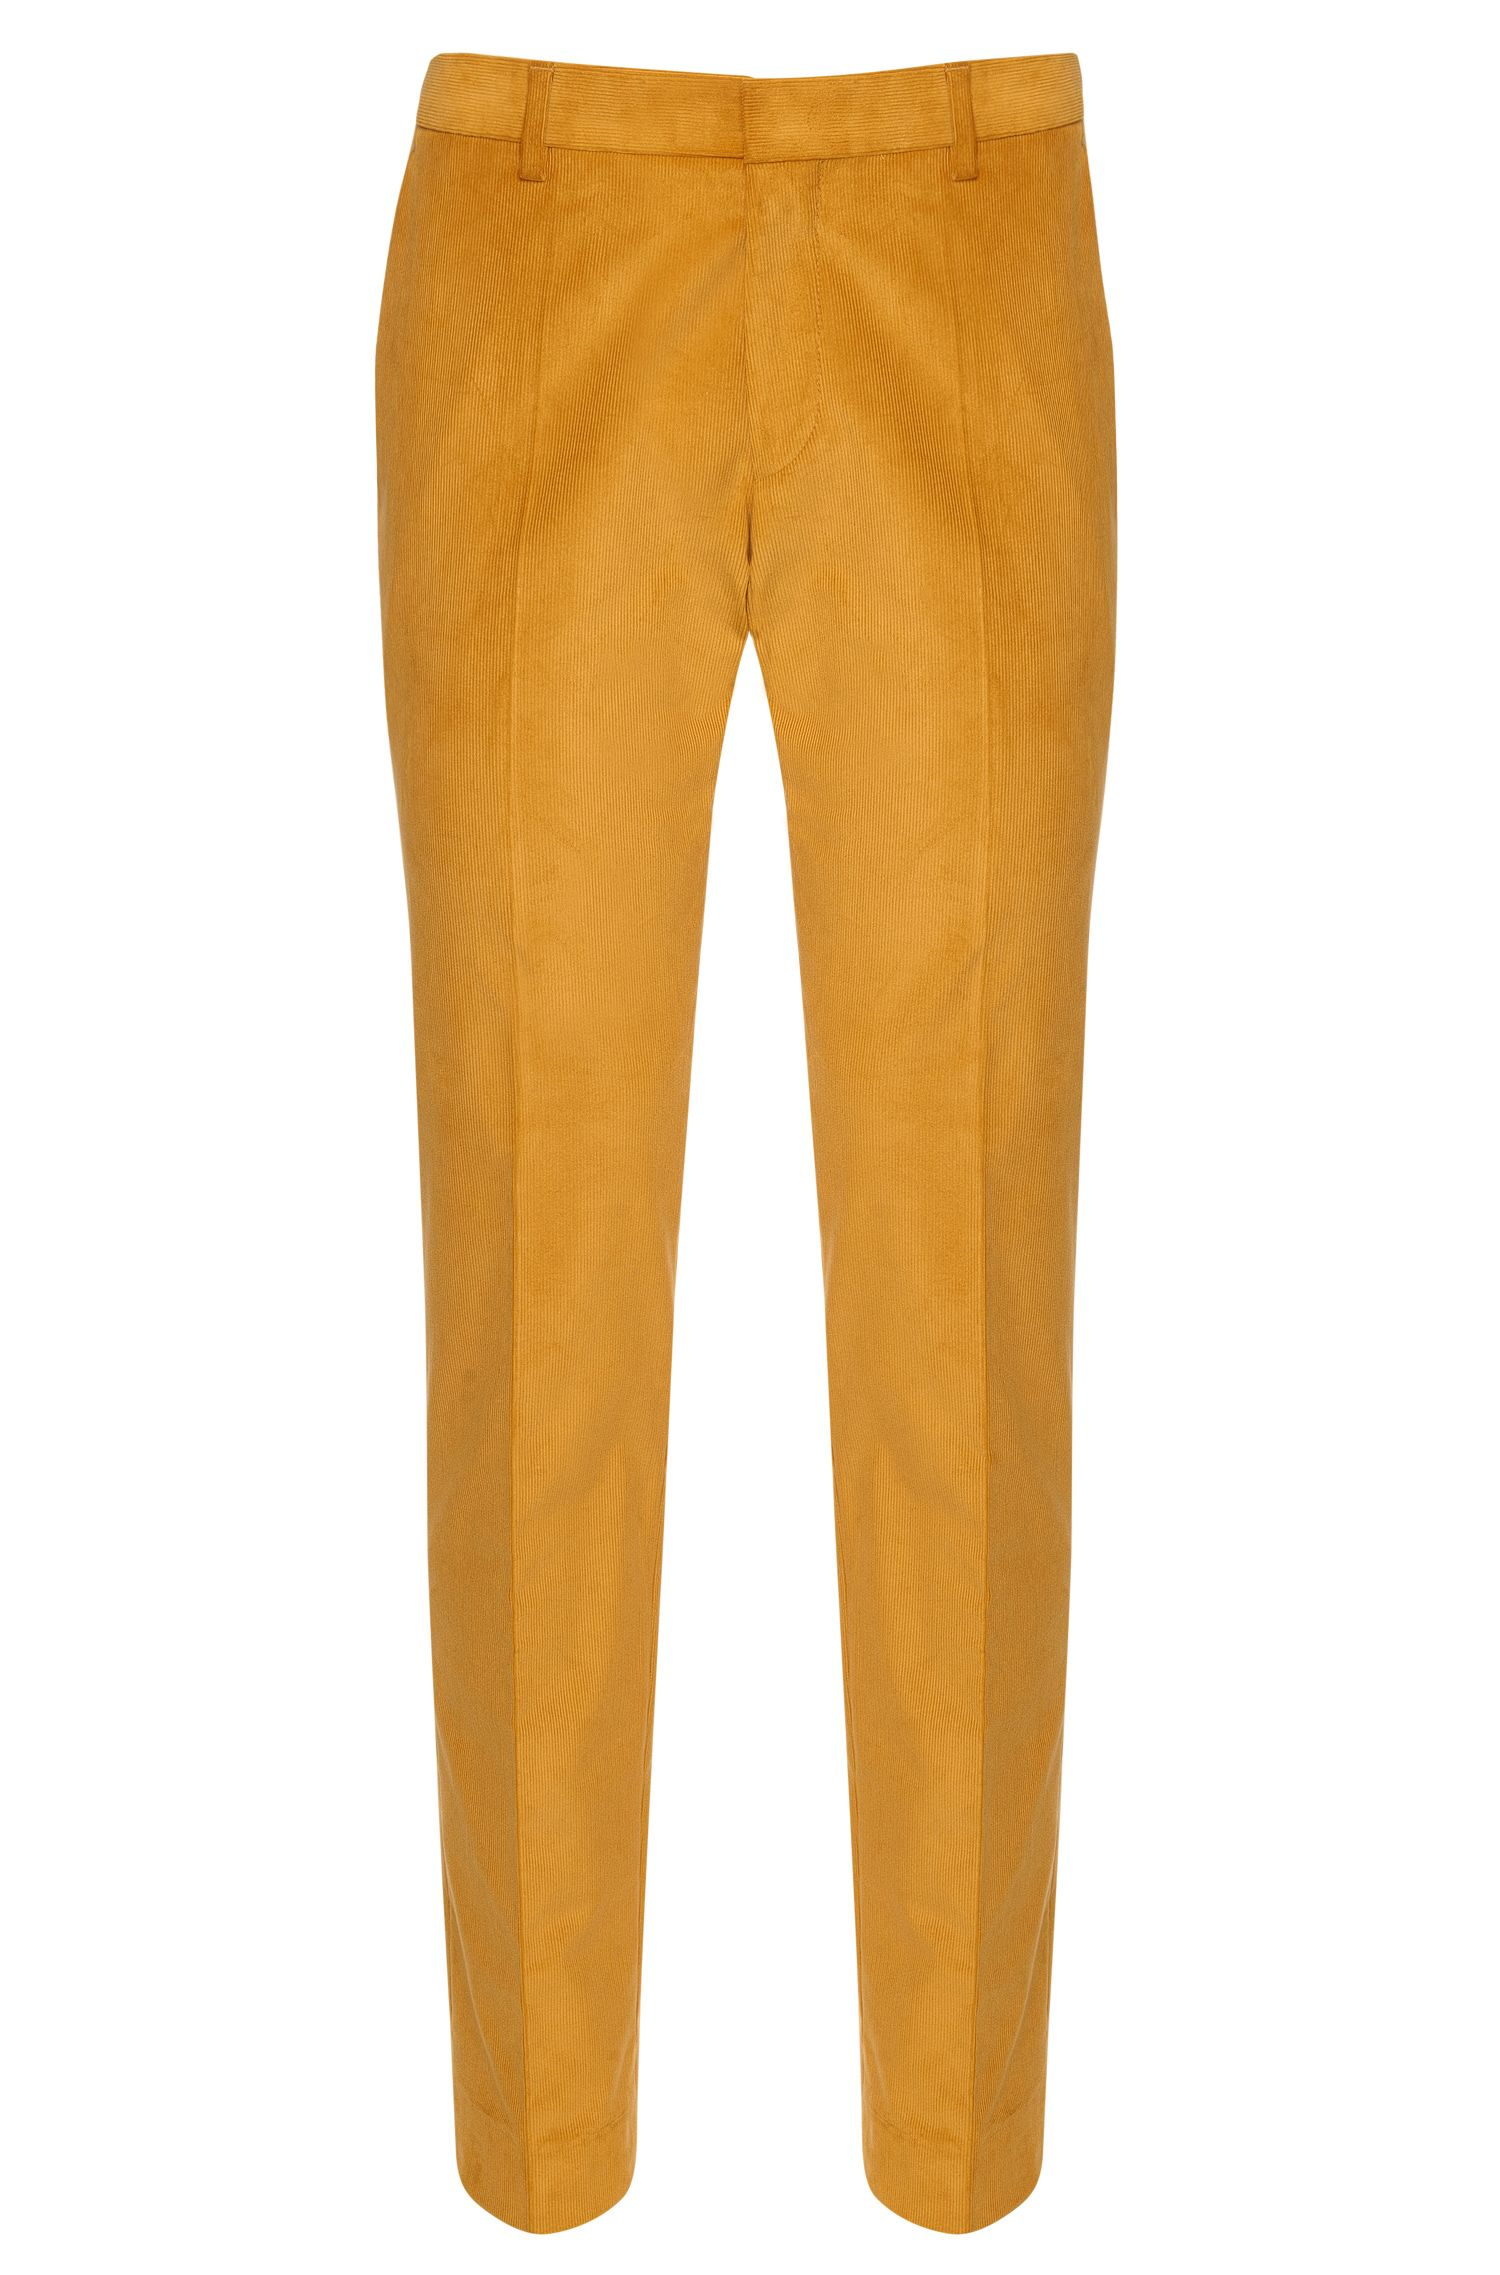 'Genesis' | Slim Fit, Stretch Cotton Corduroy Pants